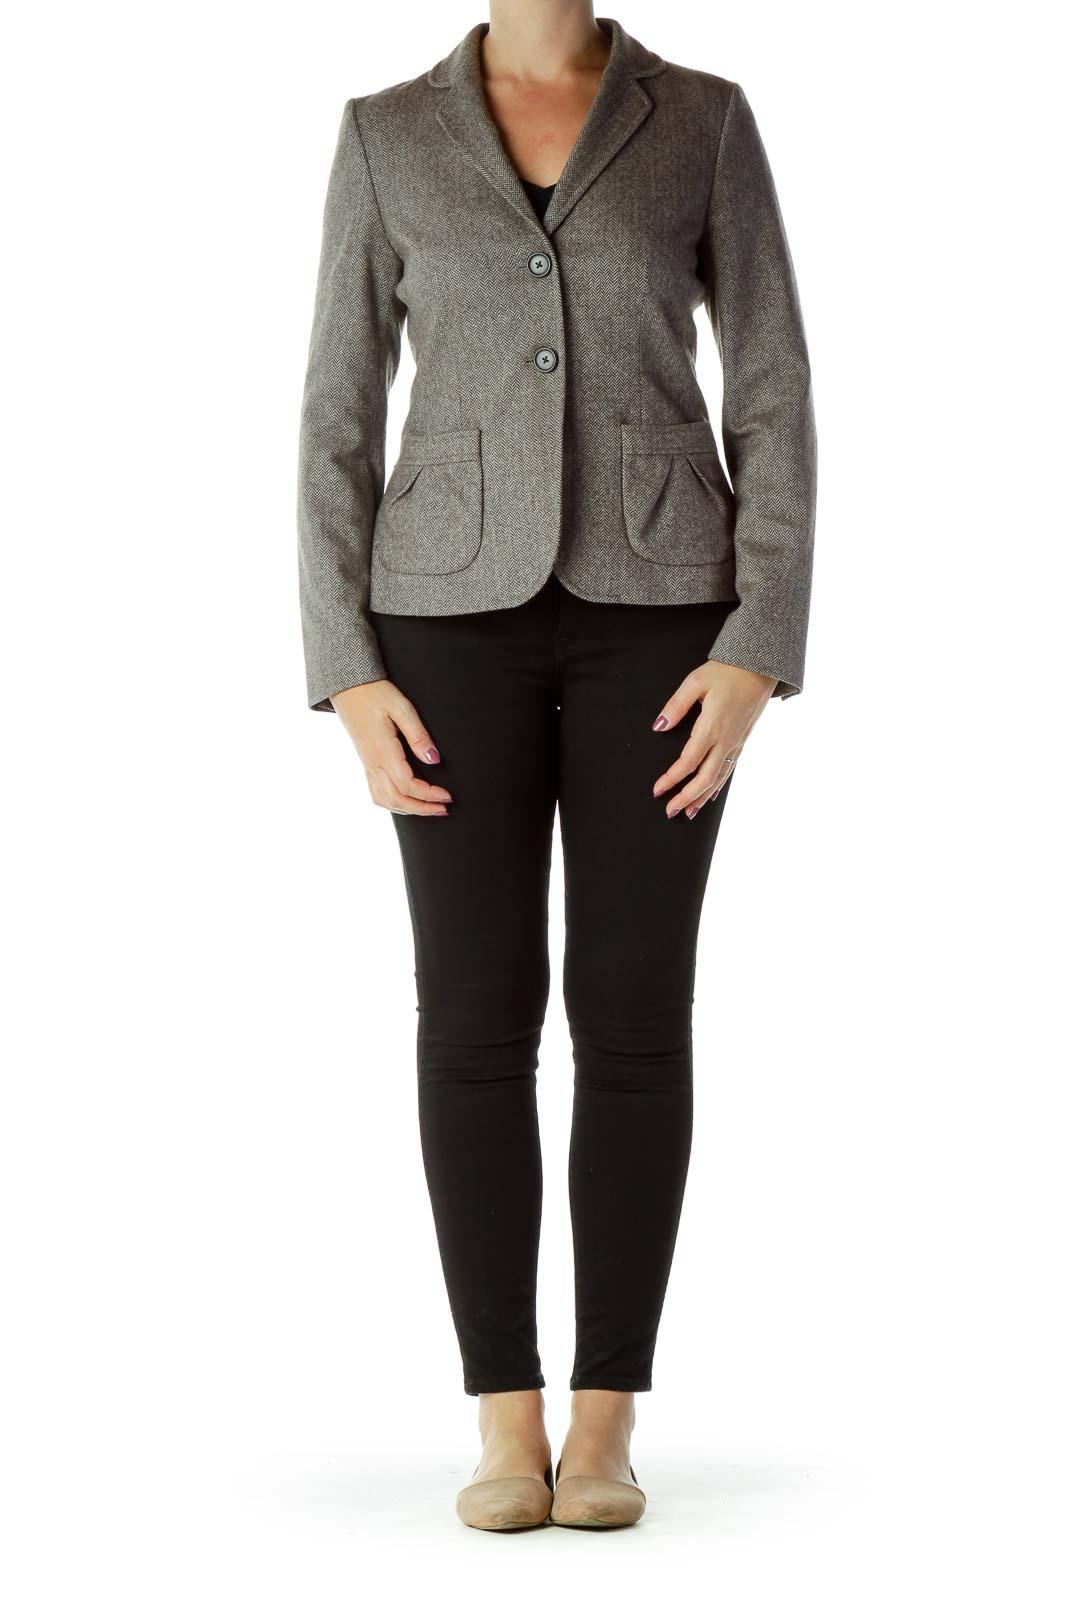 Brown Chevron Suit Jacket